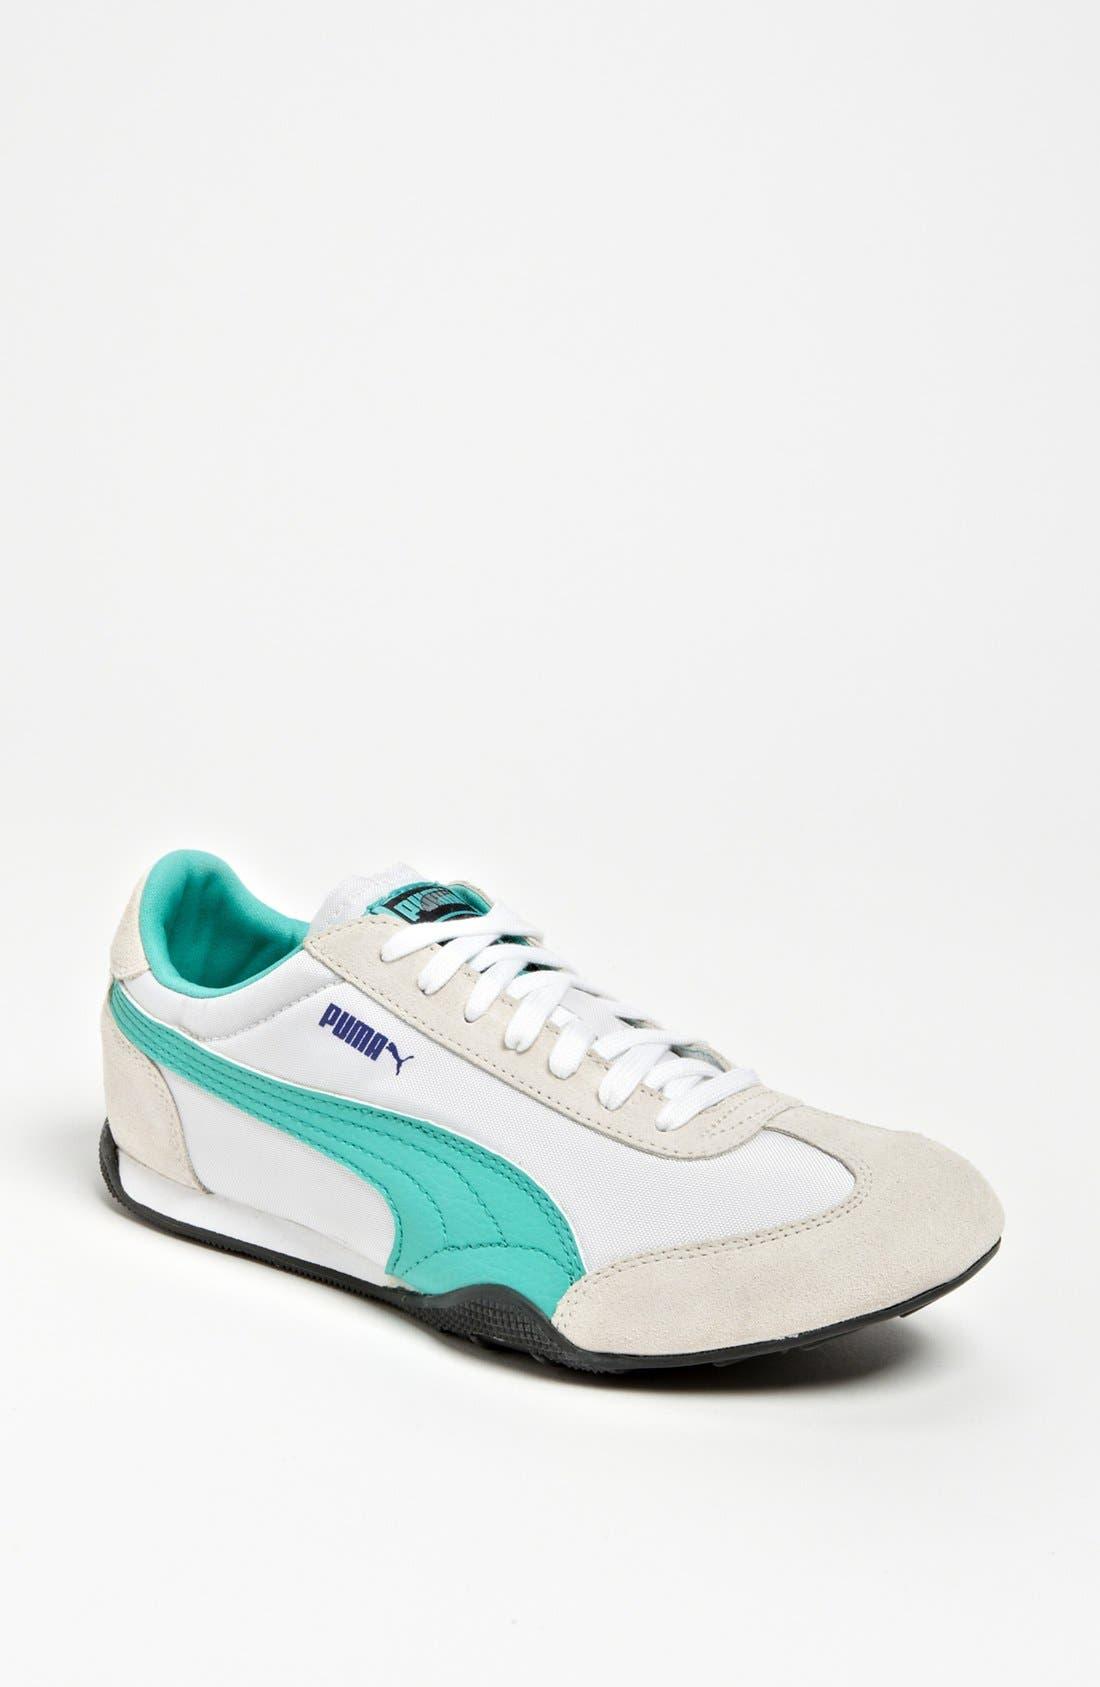 Main Image - PUMA 'Mirage 76' Sneaker